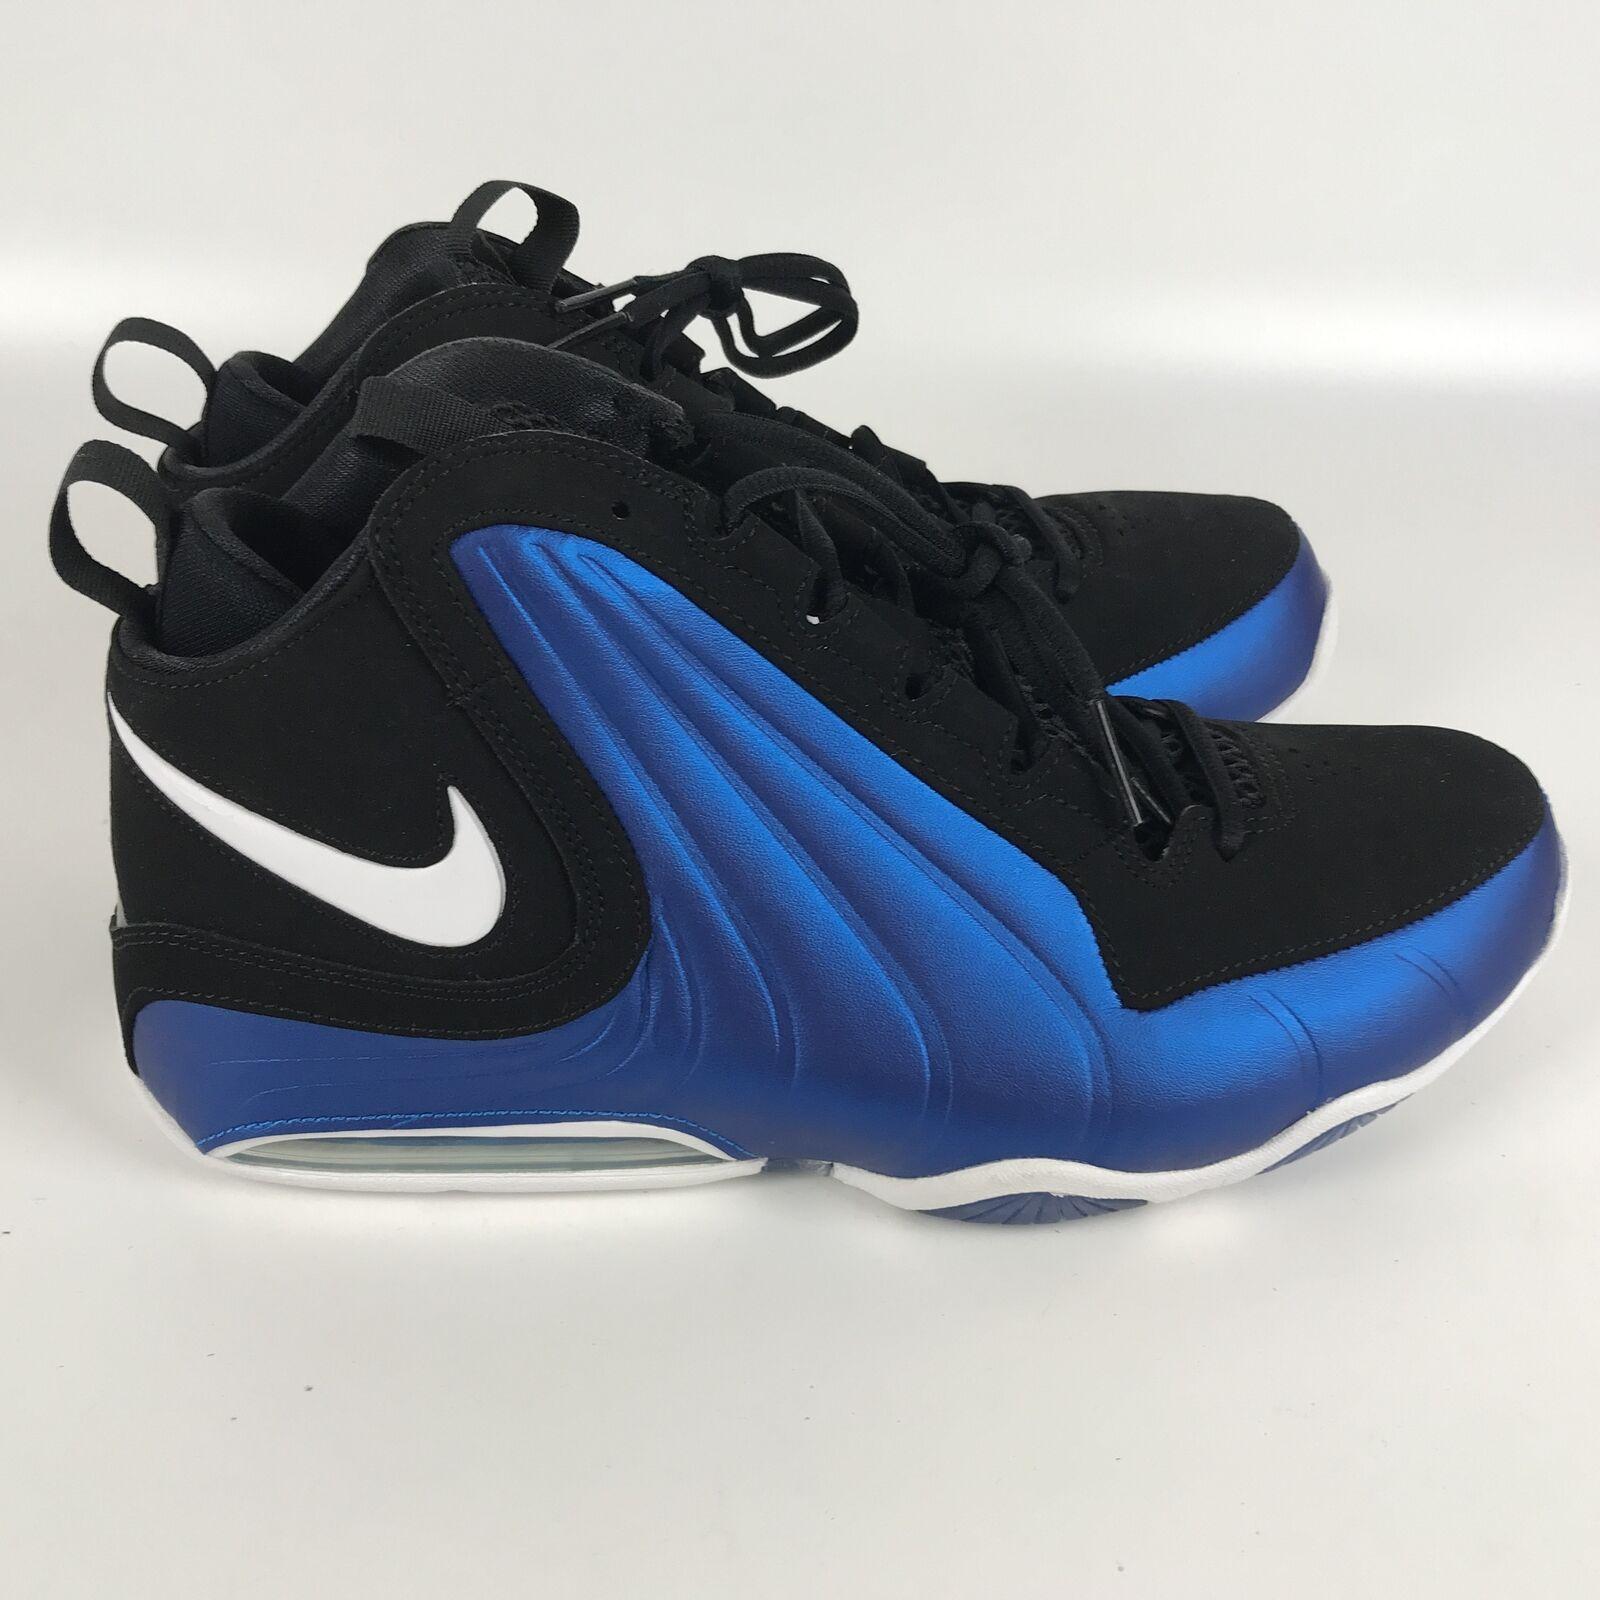 Nike Air Max WAVY Men's size 11 Basketball Shoes Penny Blue Black AV8061 002